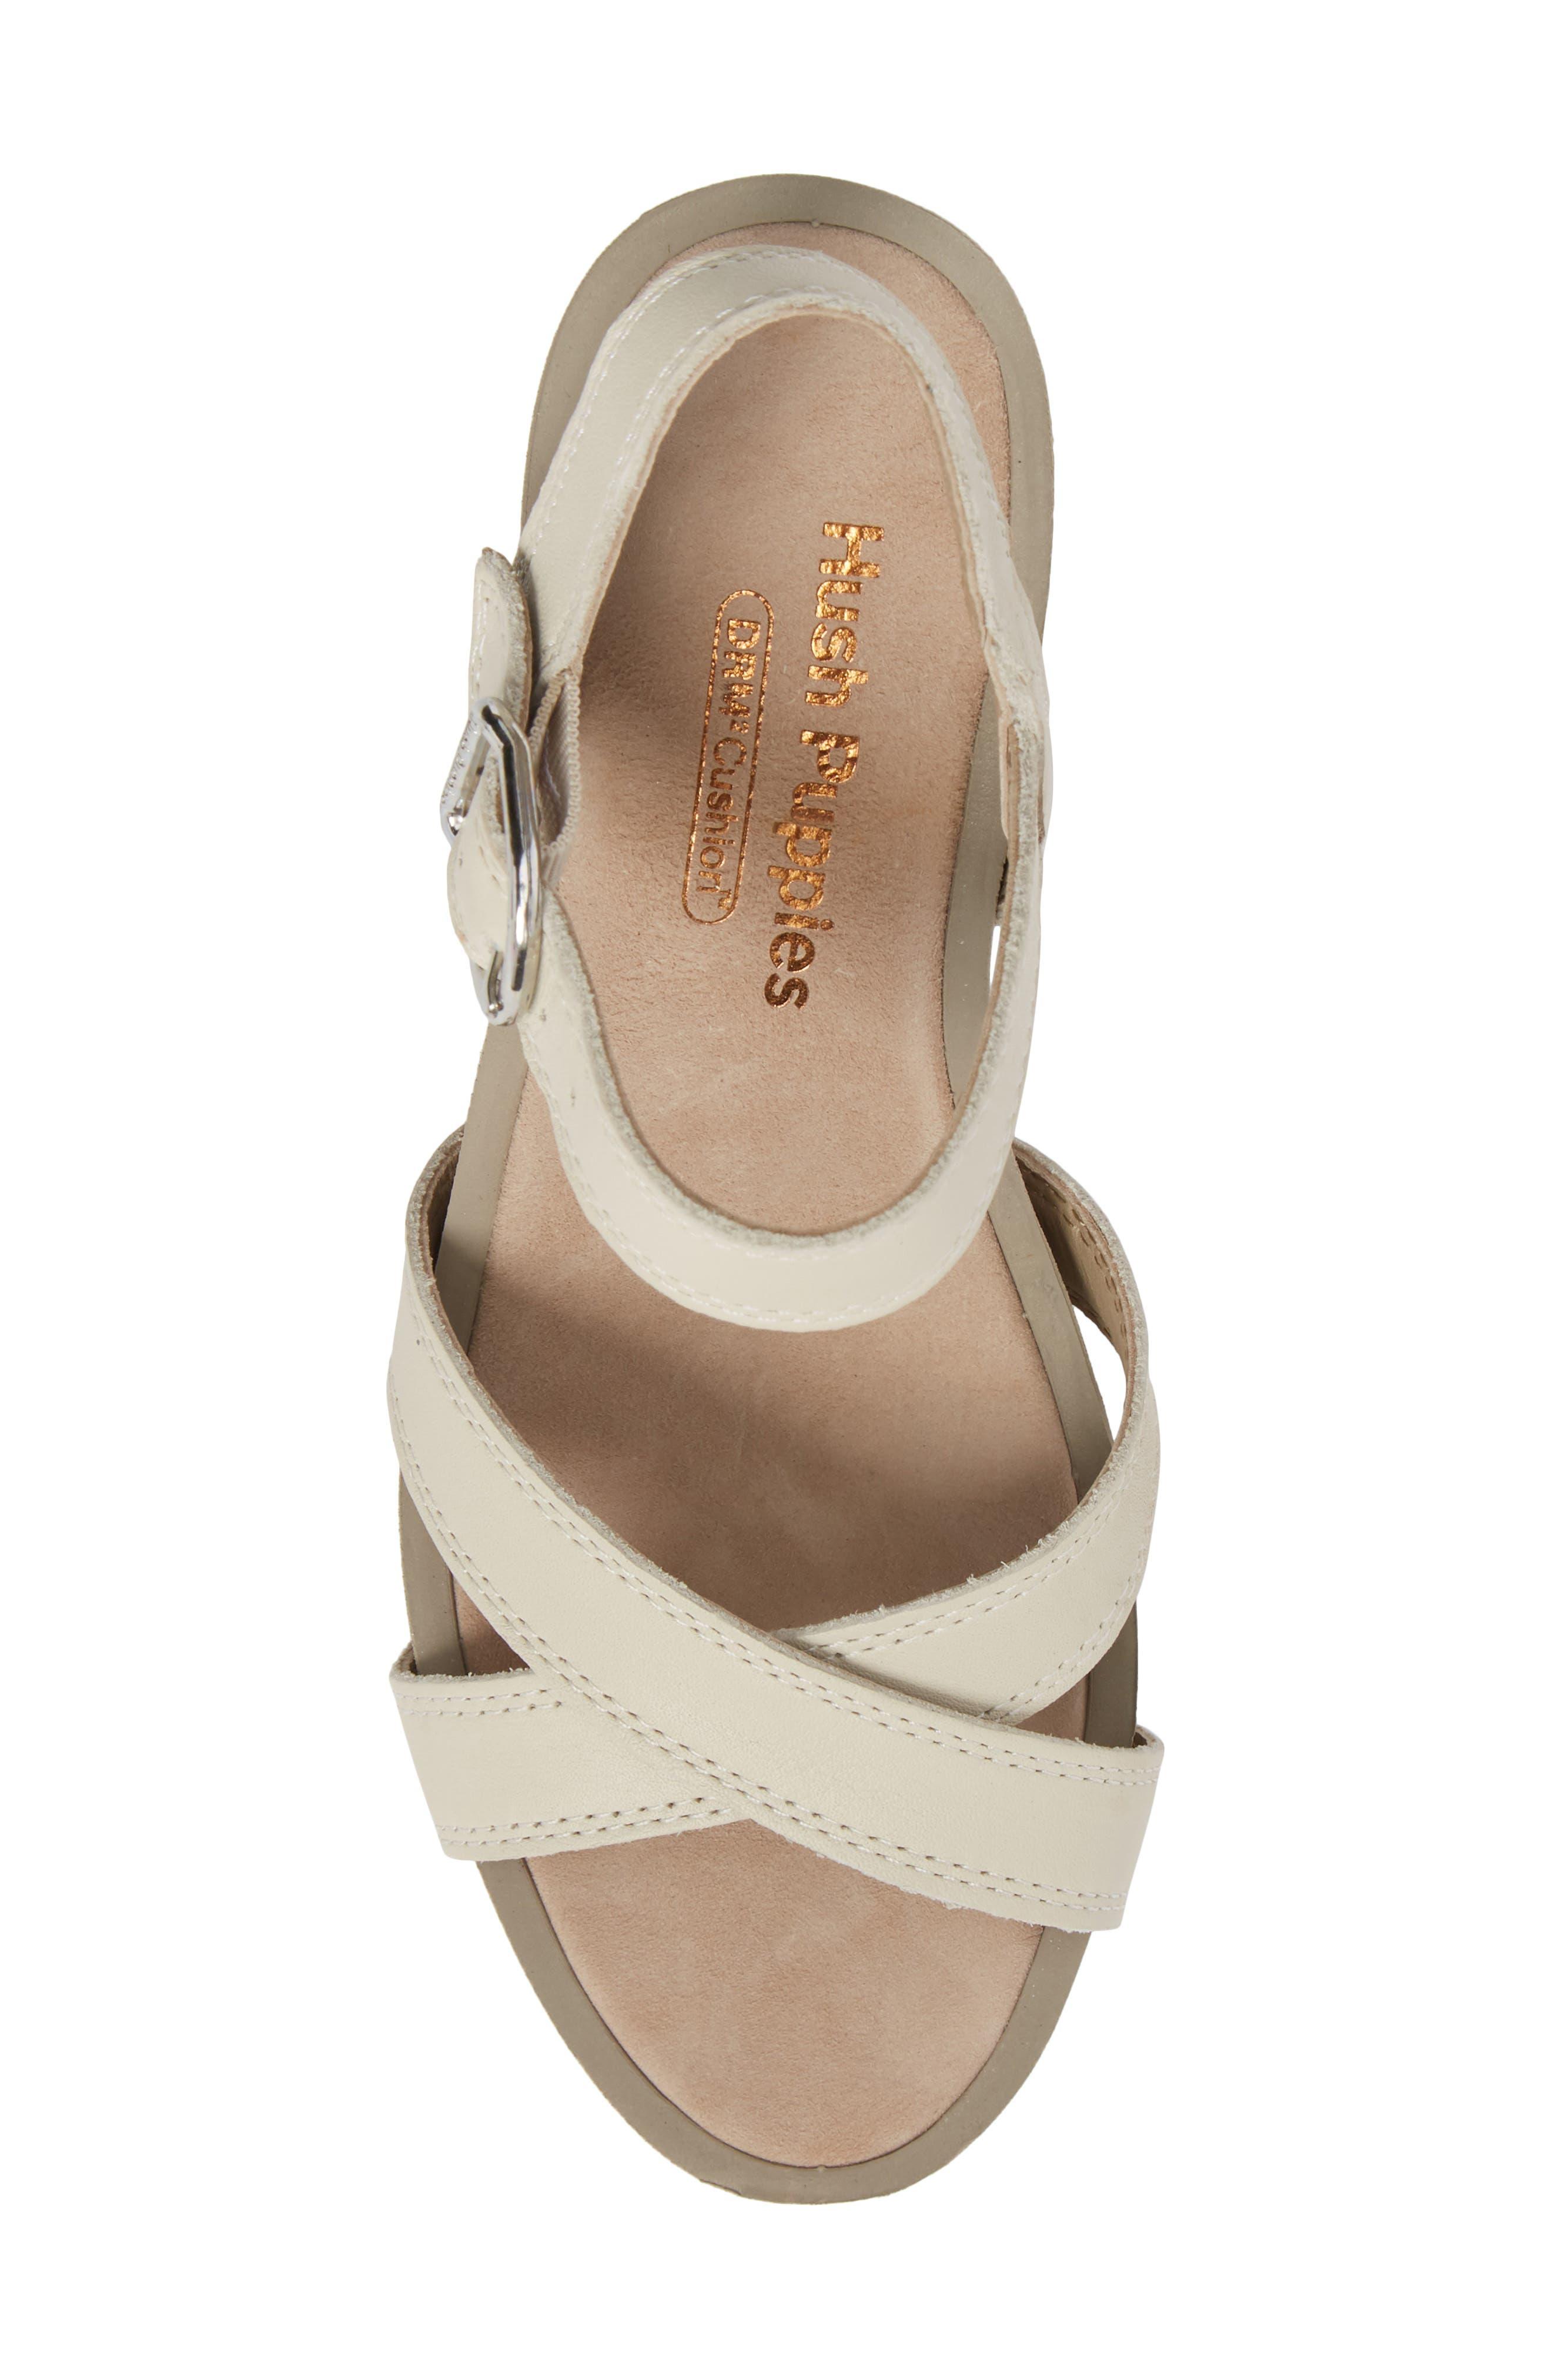 Mariska Block Heel Sandal,                             Alternate thumbnail 10, color,